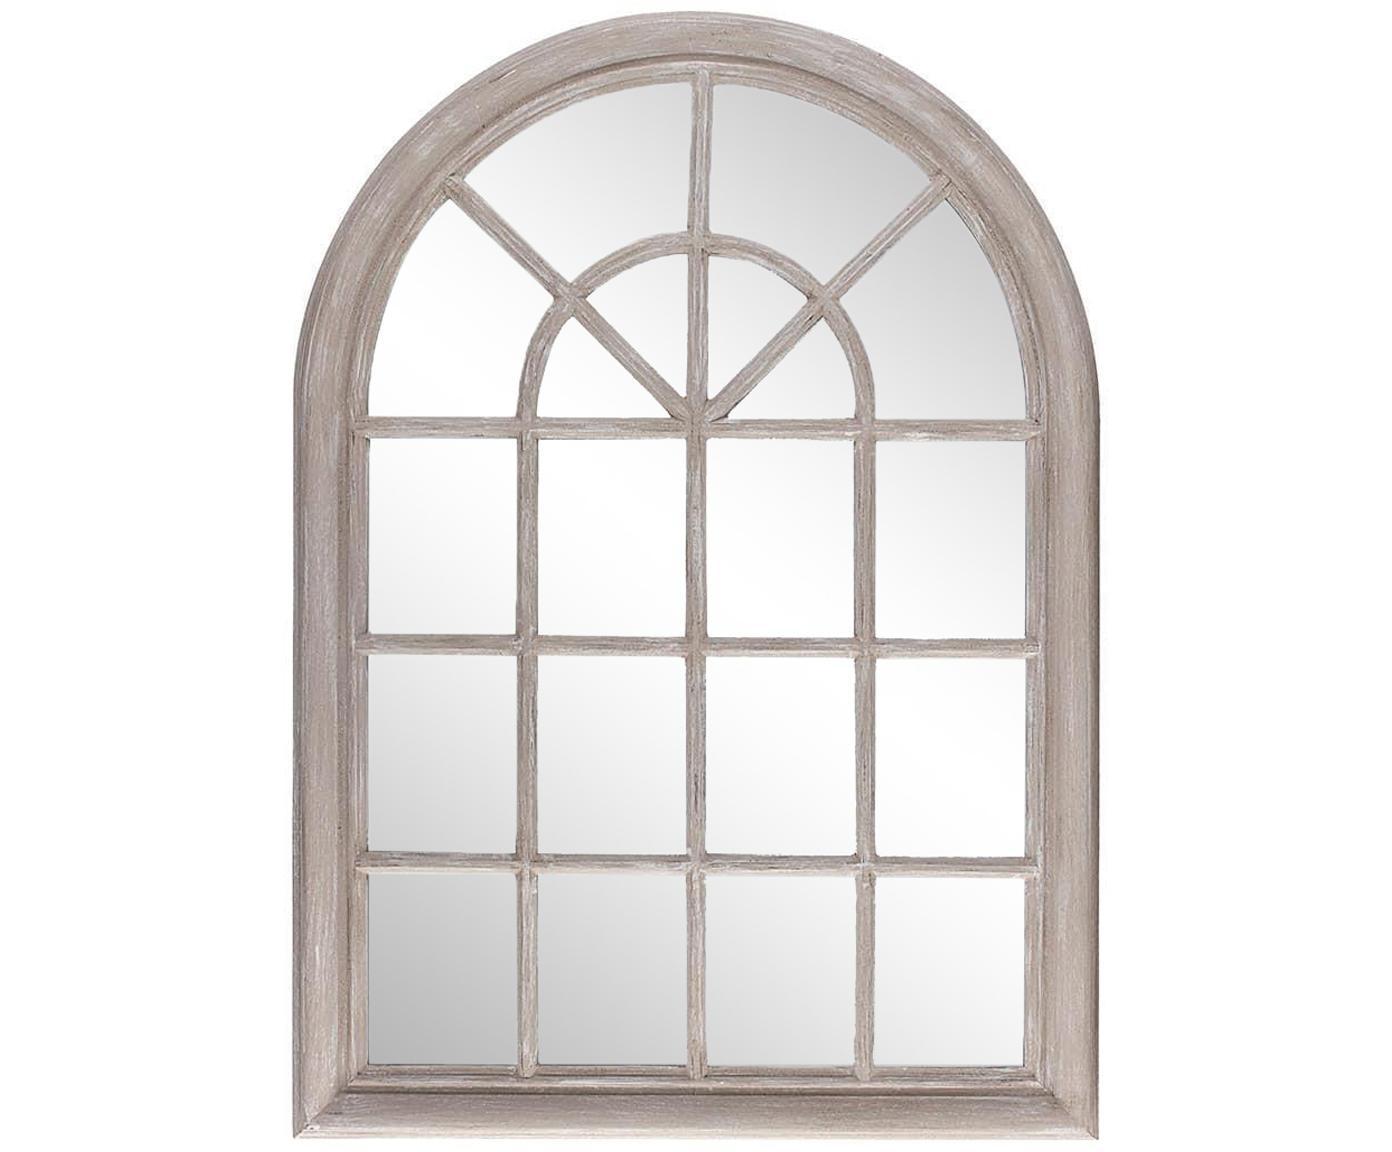 Espejo de pared Window, Madera de Paulownia, espejo de cristal, Beige, An 74 x Al 104 cm